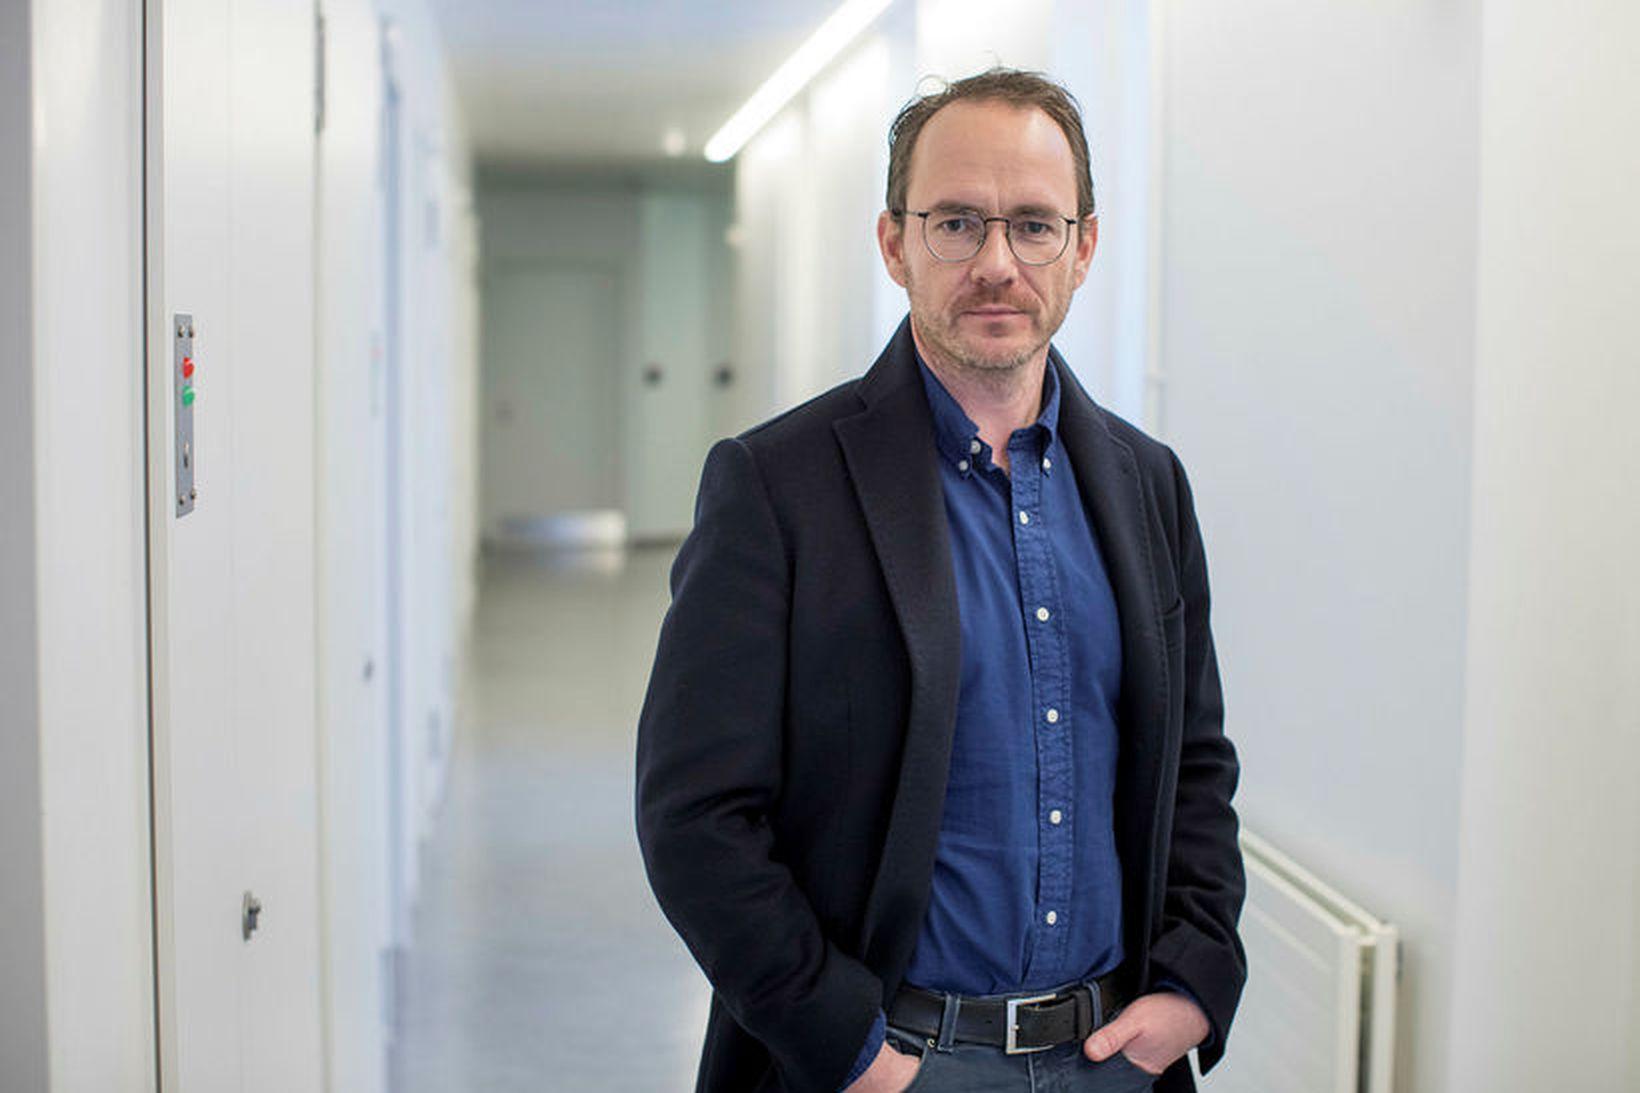 Páll Winkel fangelsismálastjóri vonar að flótti fanga úr fangelsinu Sogni …